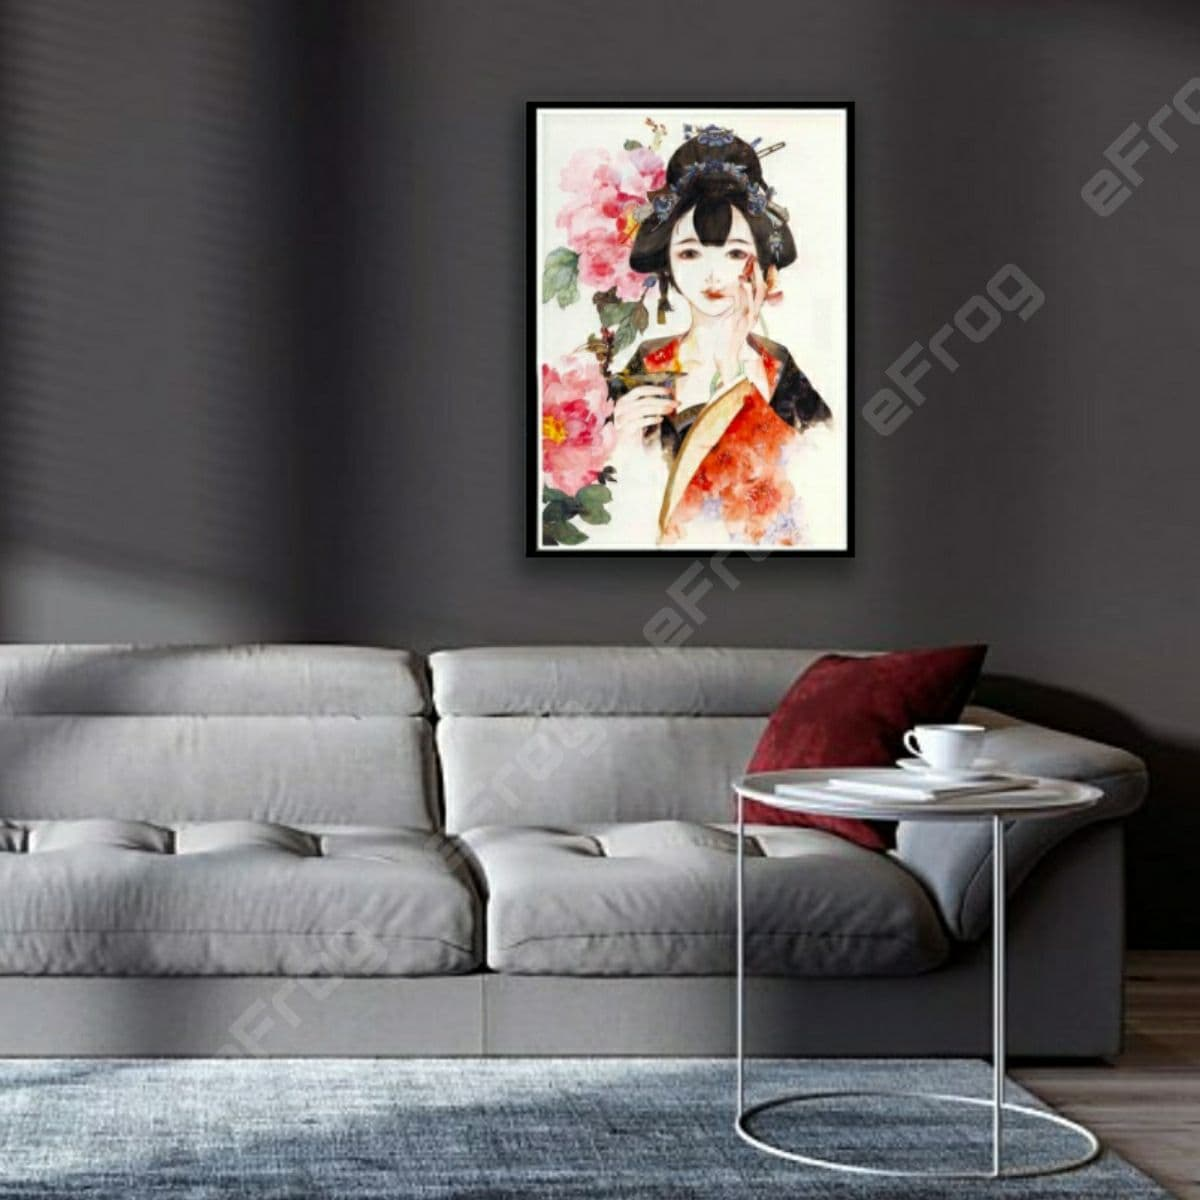 japaneese woman1